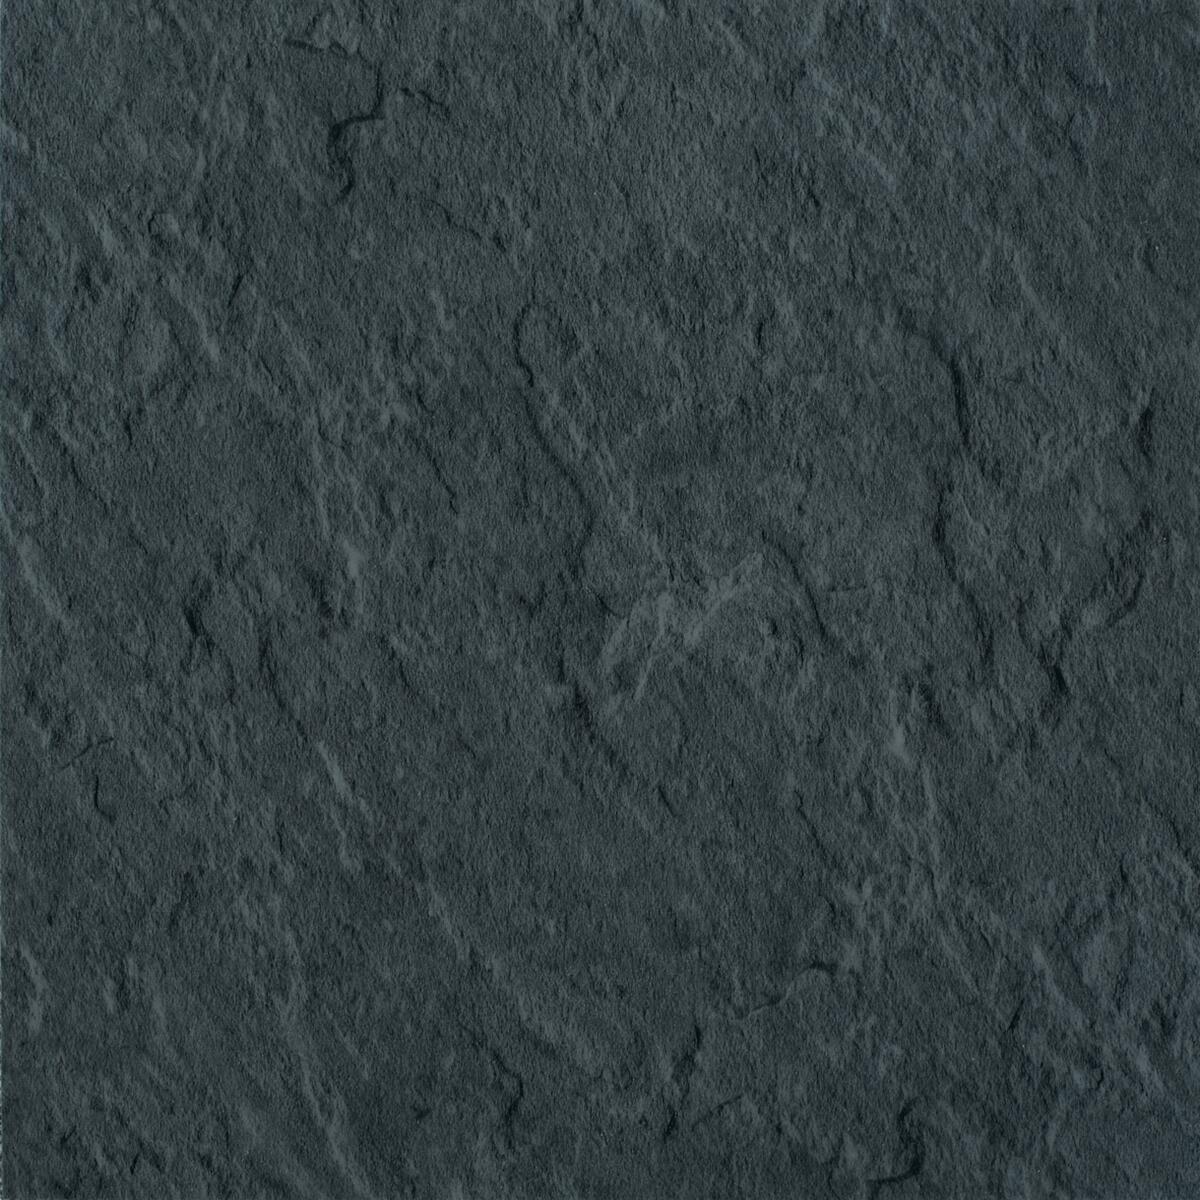 Pavimento PVC adesivo Slate Sp 1.5 mm nero - 3